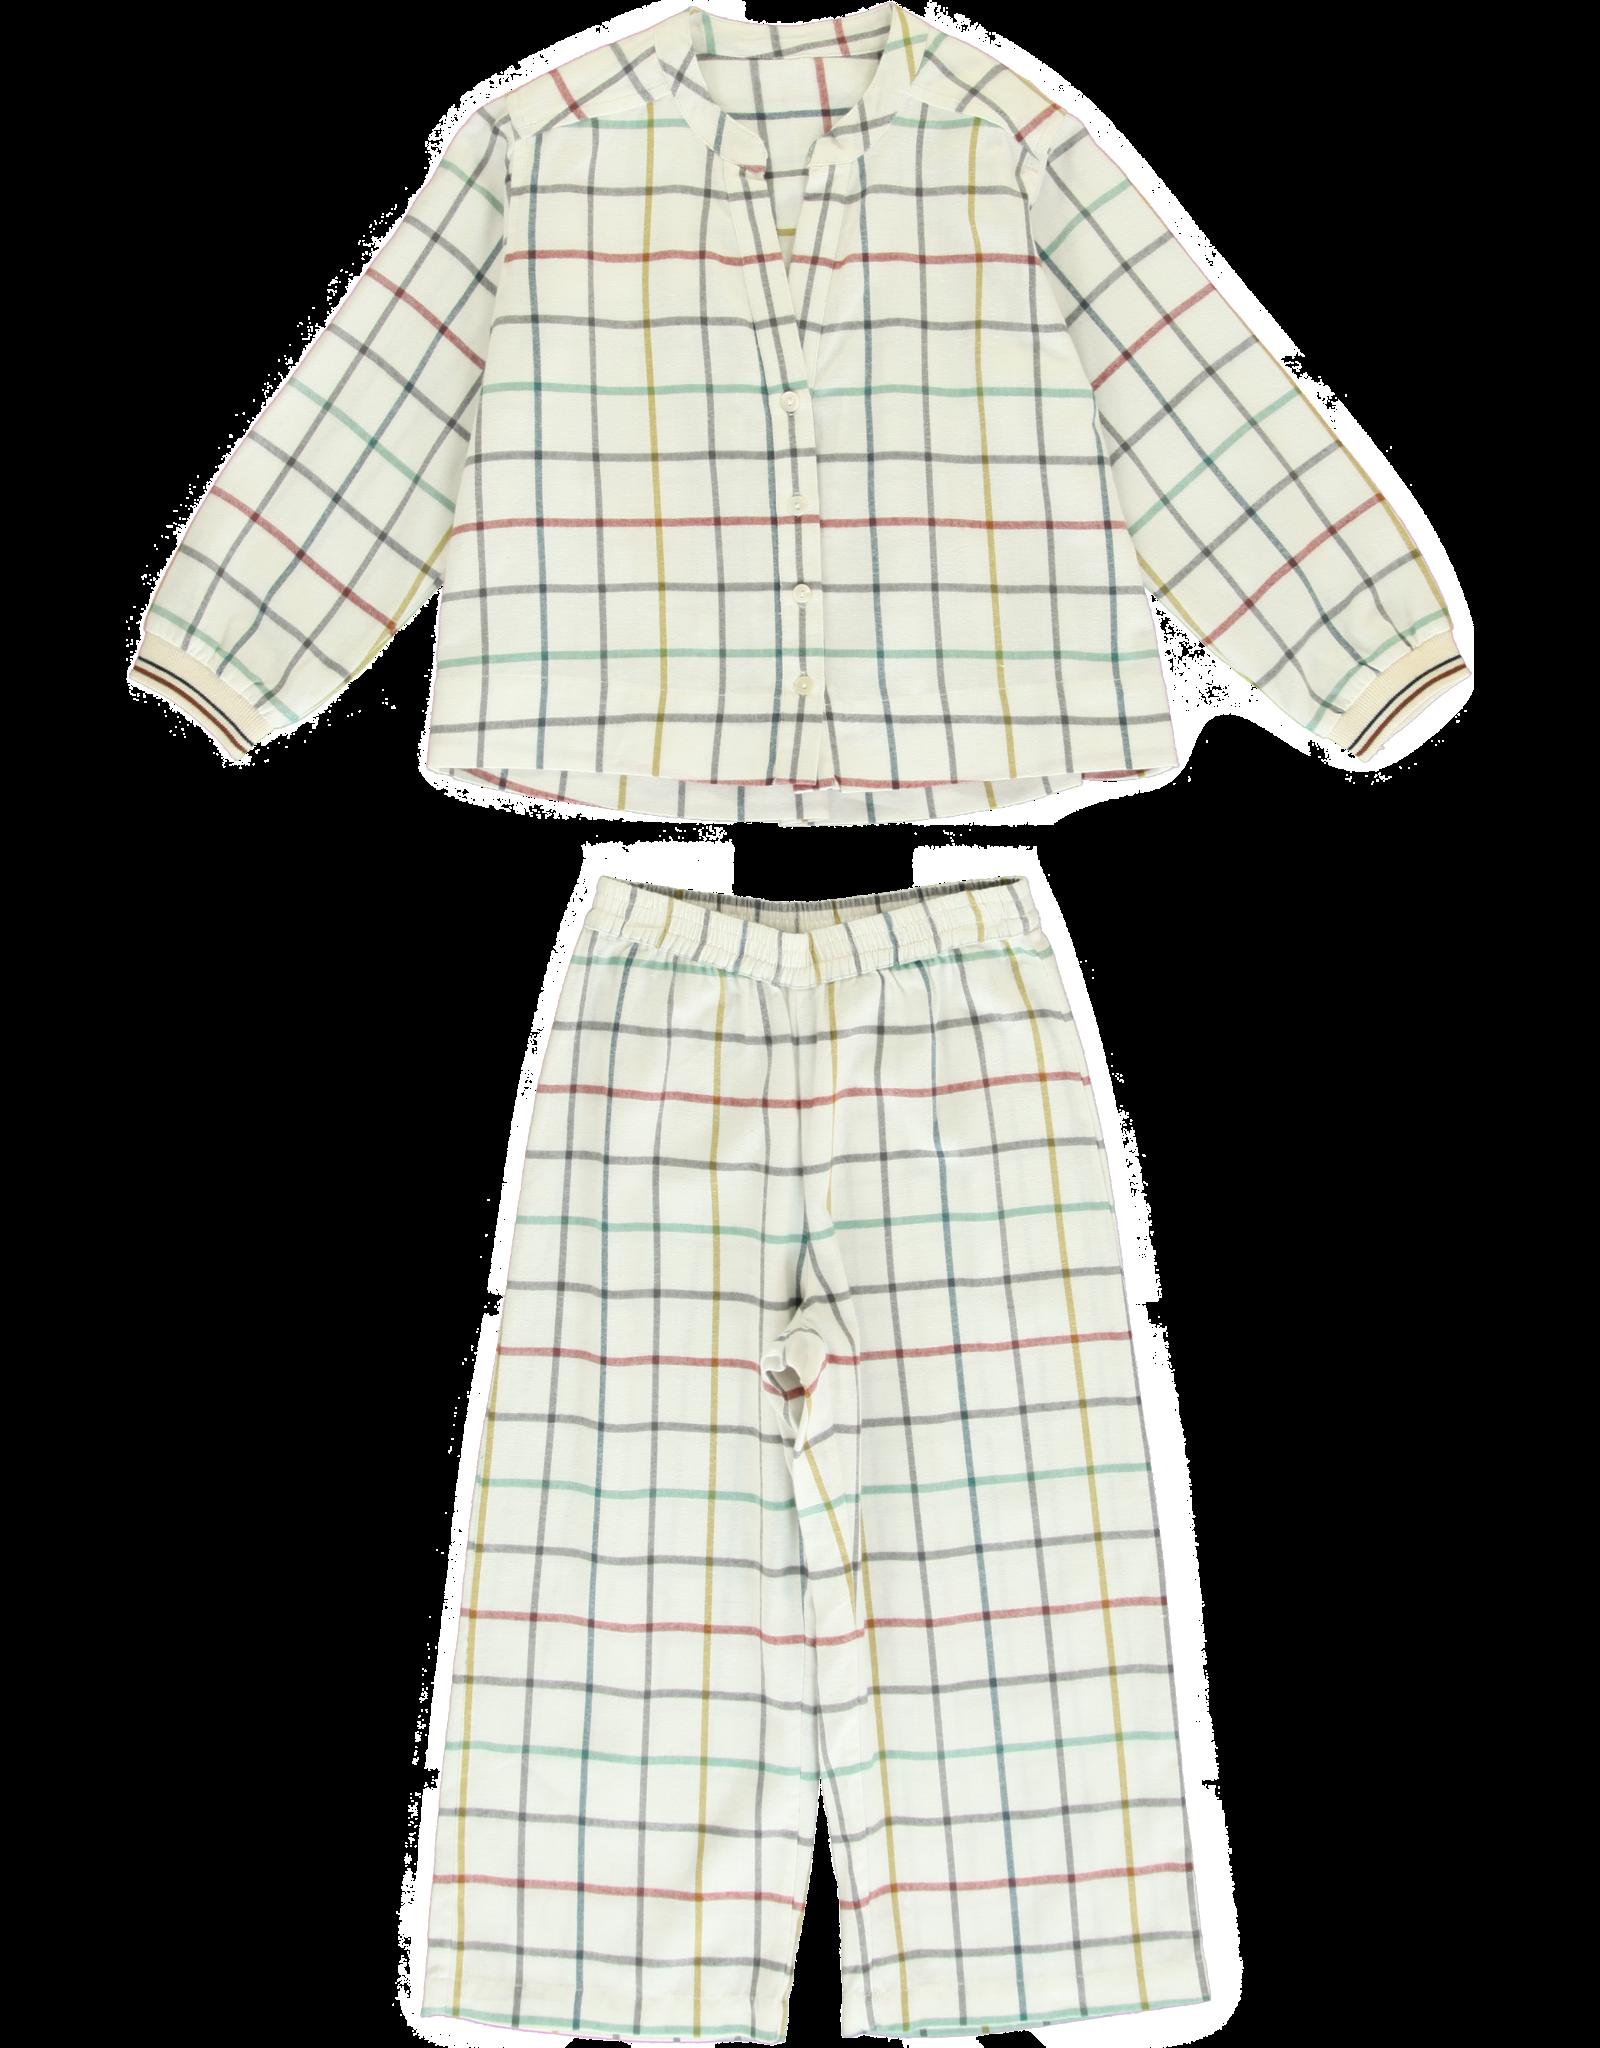 Dorélit Diane + Alkes | Pajama Set Woven | Check Multi